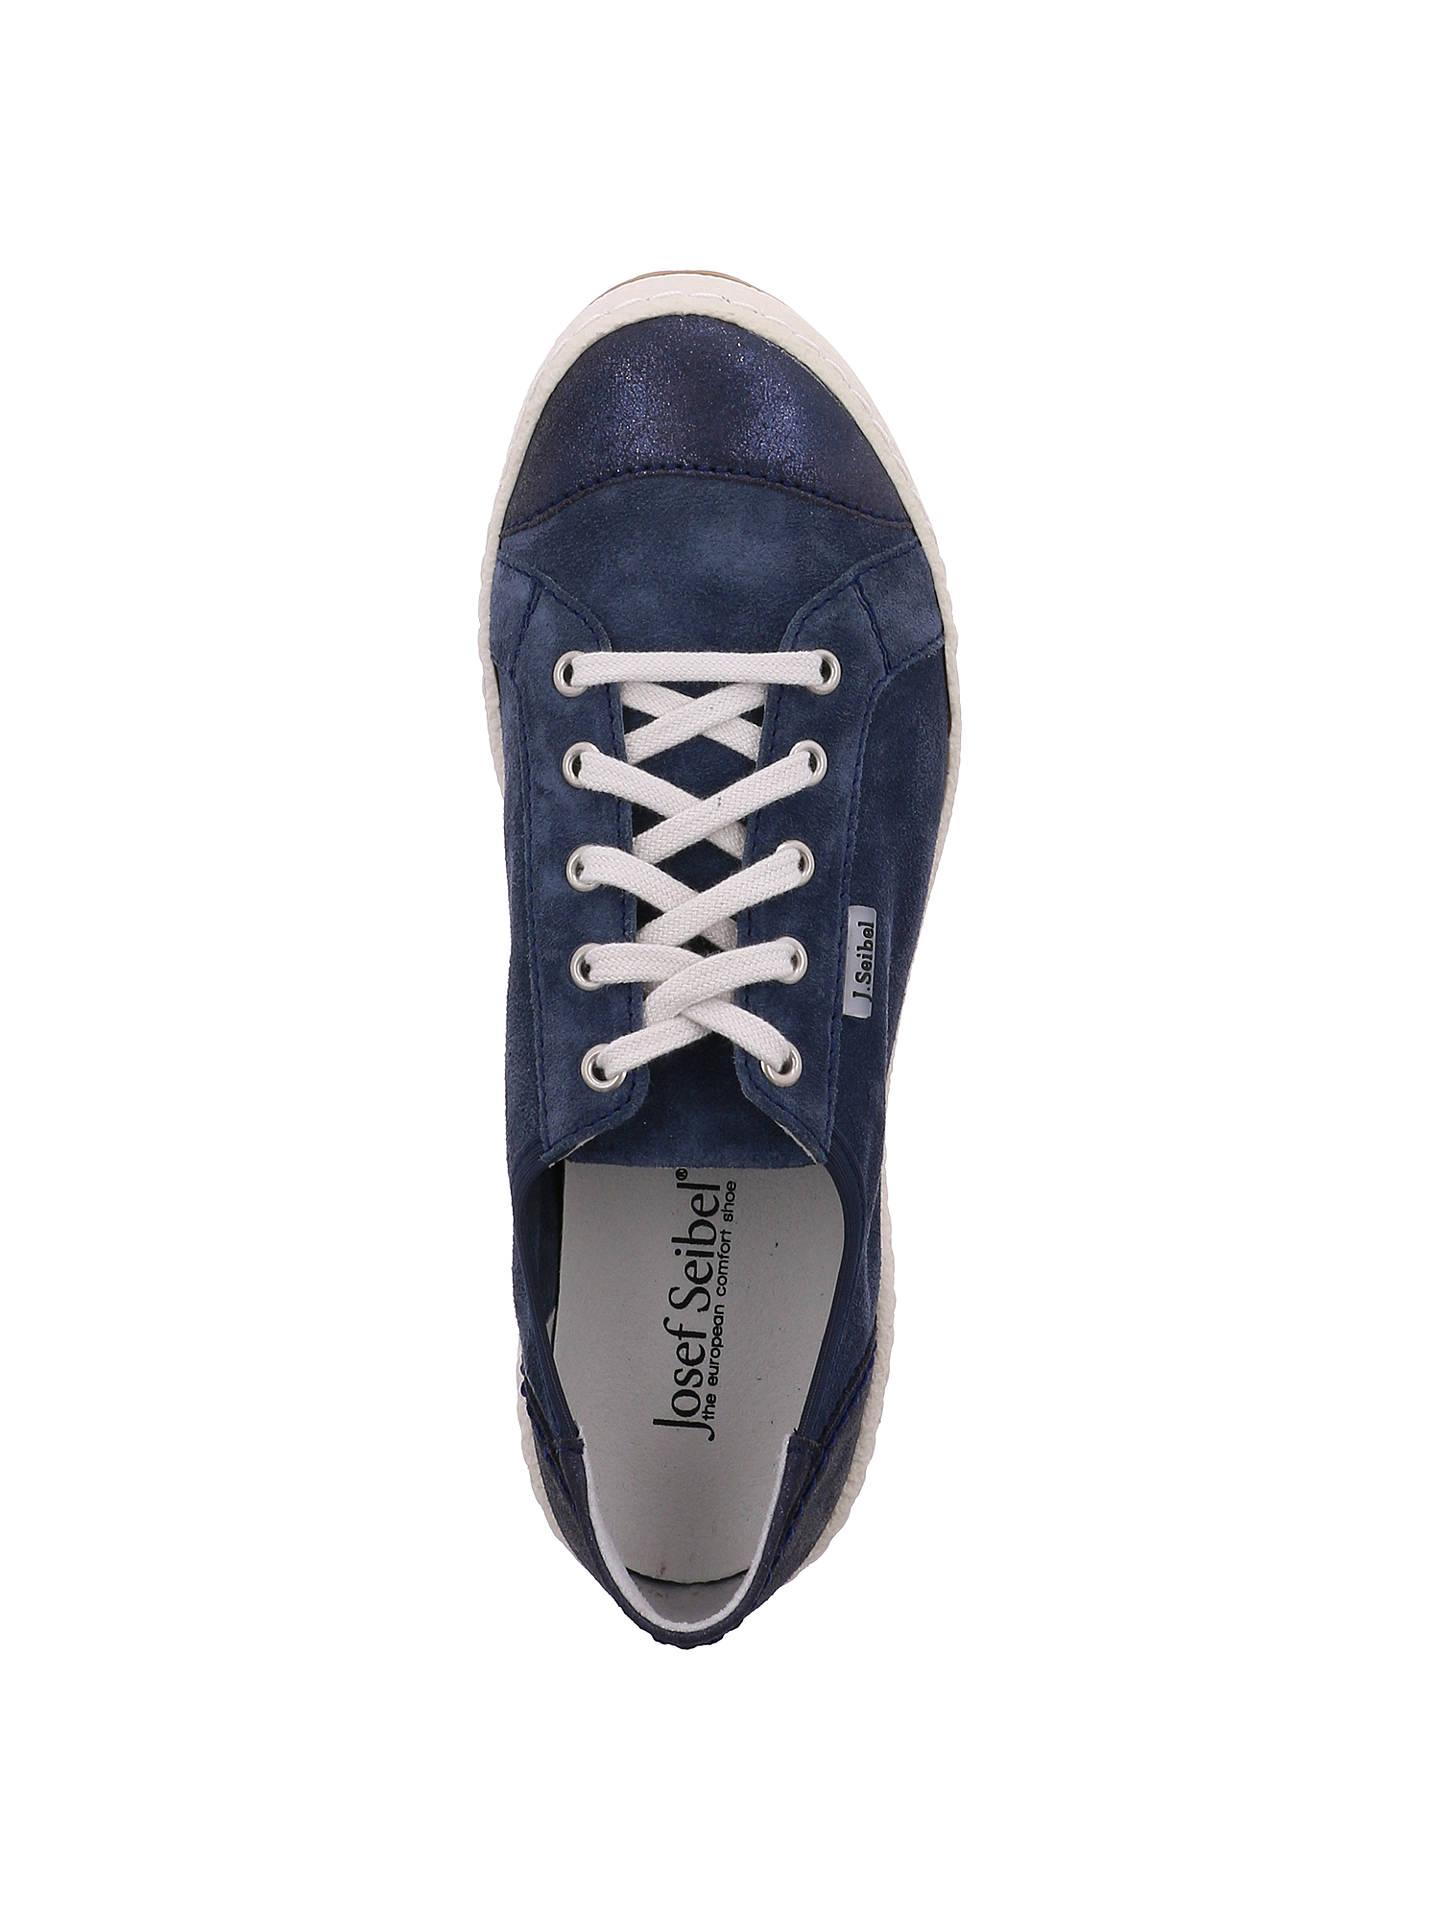 229e3b4c397d3 Josef Seibel Caspian 14 Lace Up Plimsolls, Blue Leather at John ...